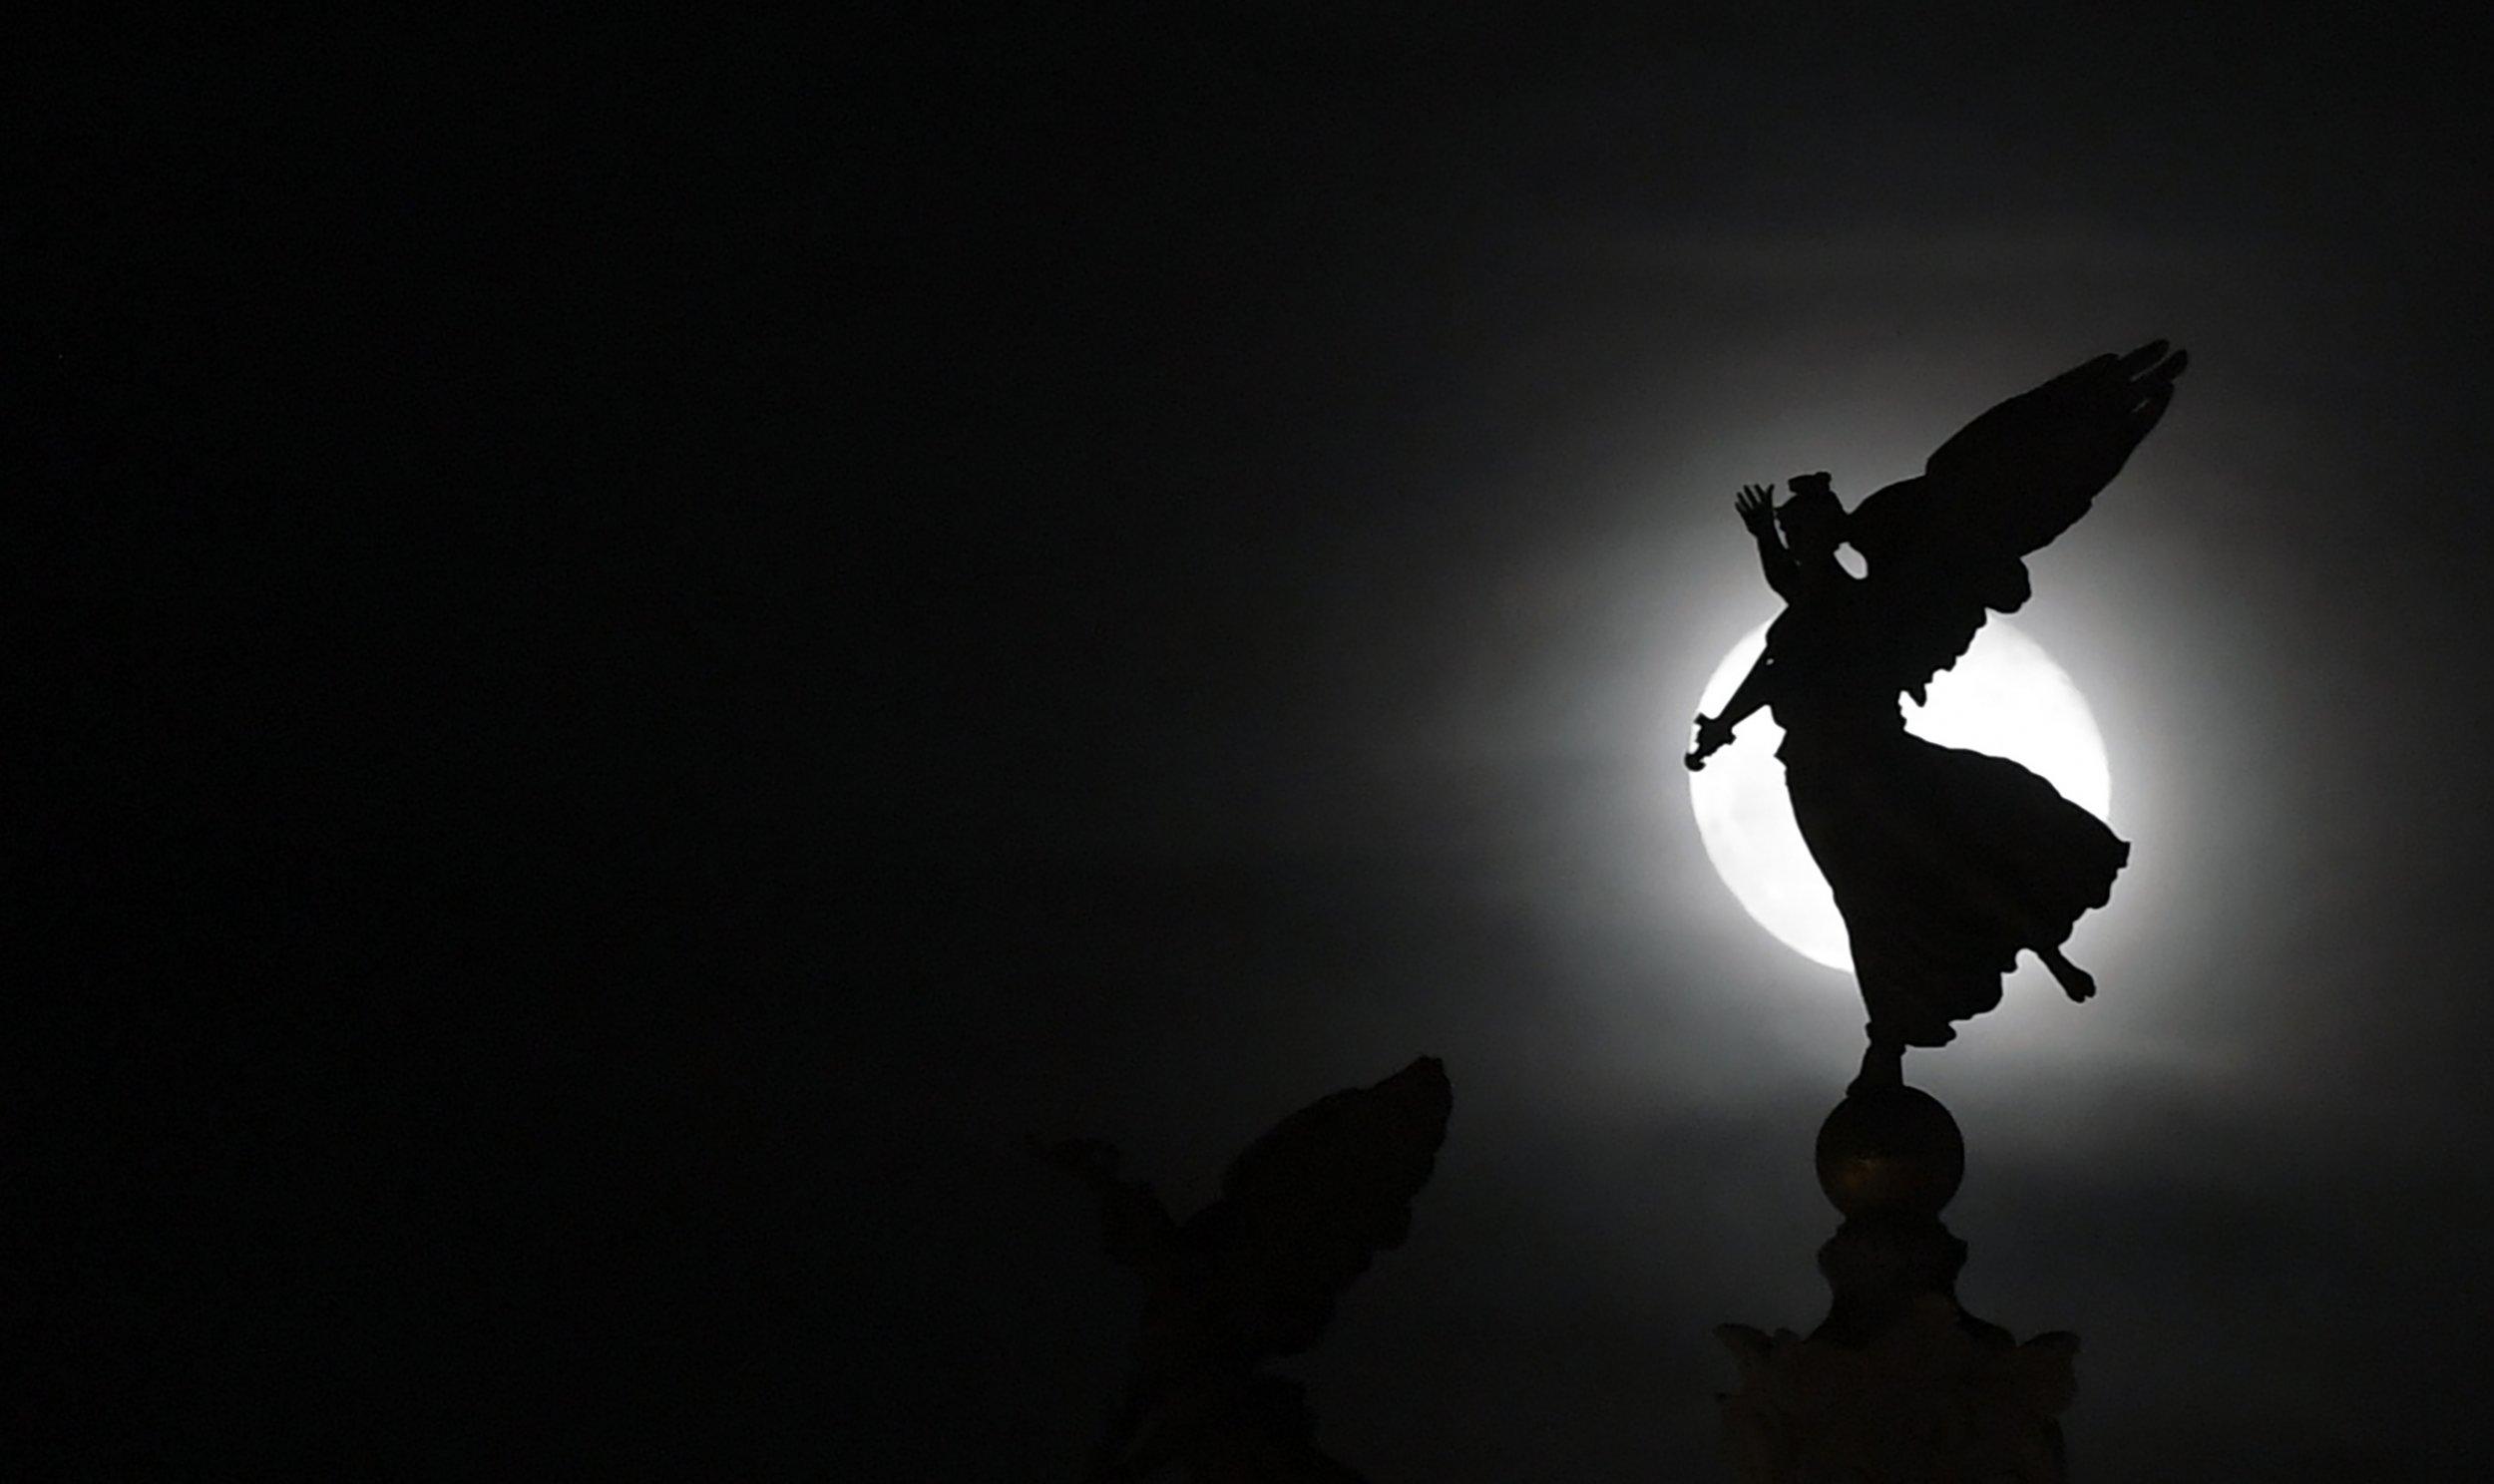 12_29_full_moon_occultation